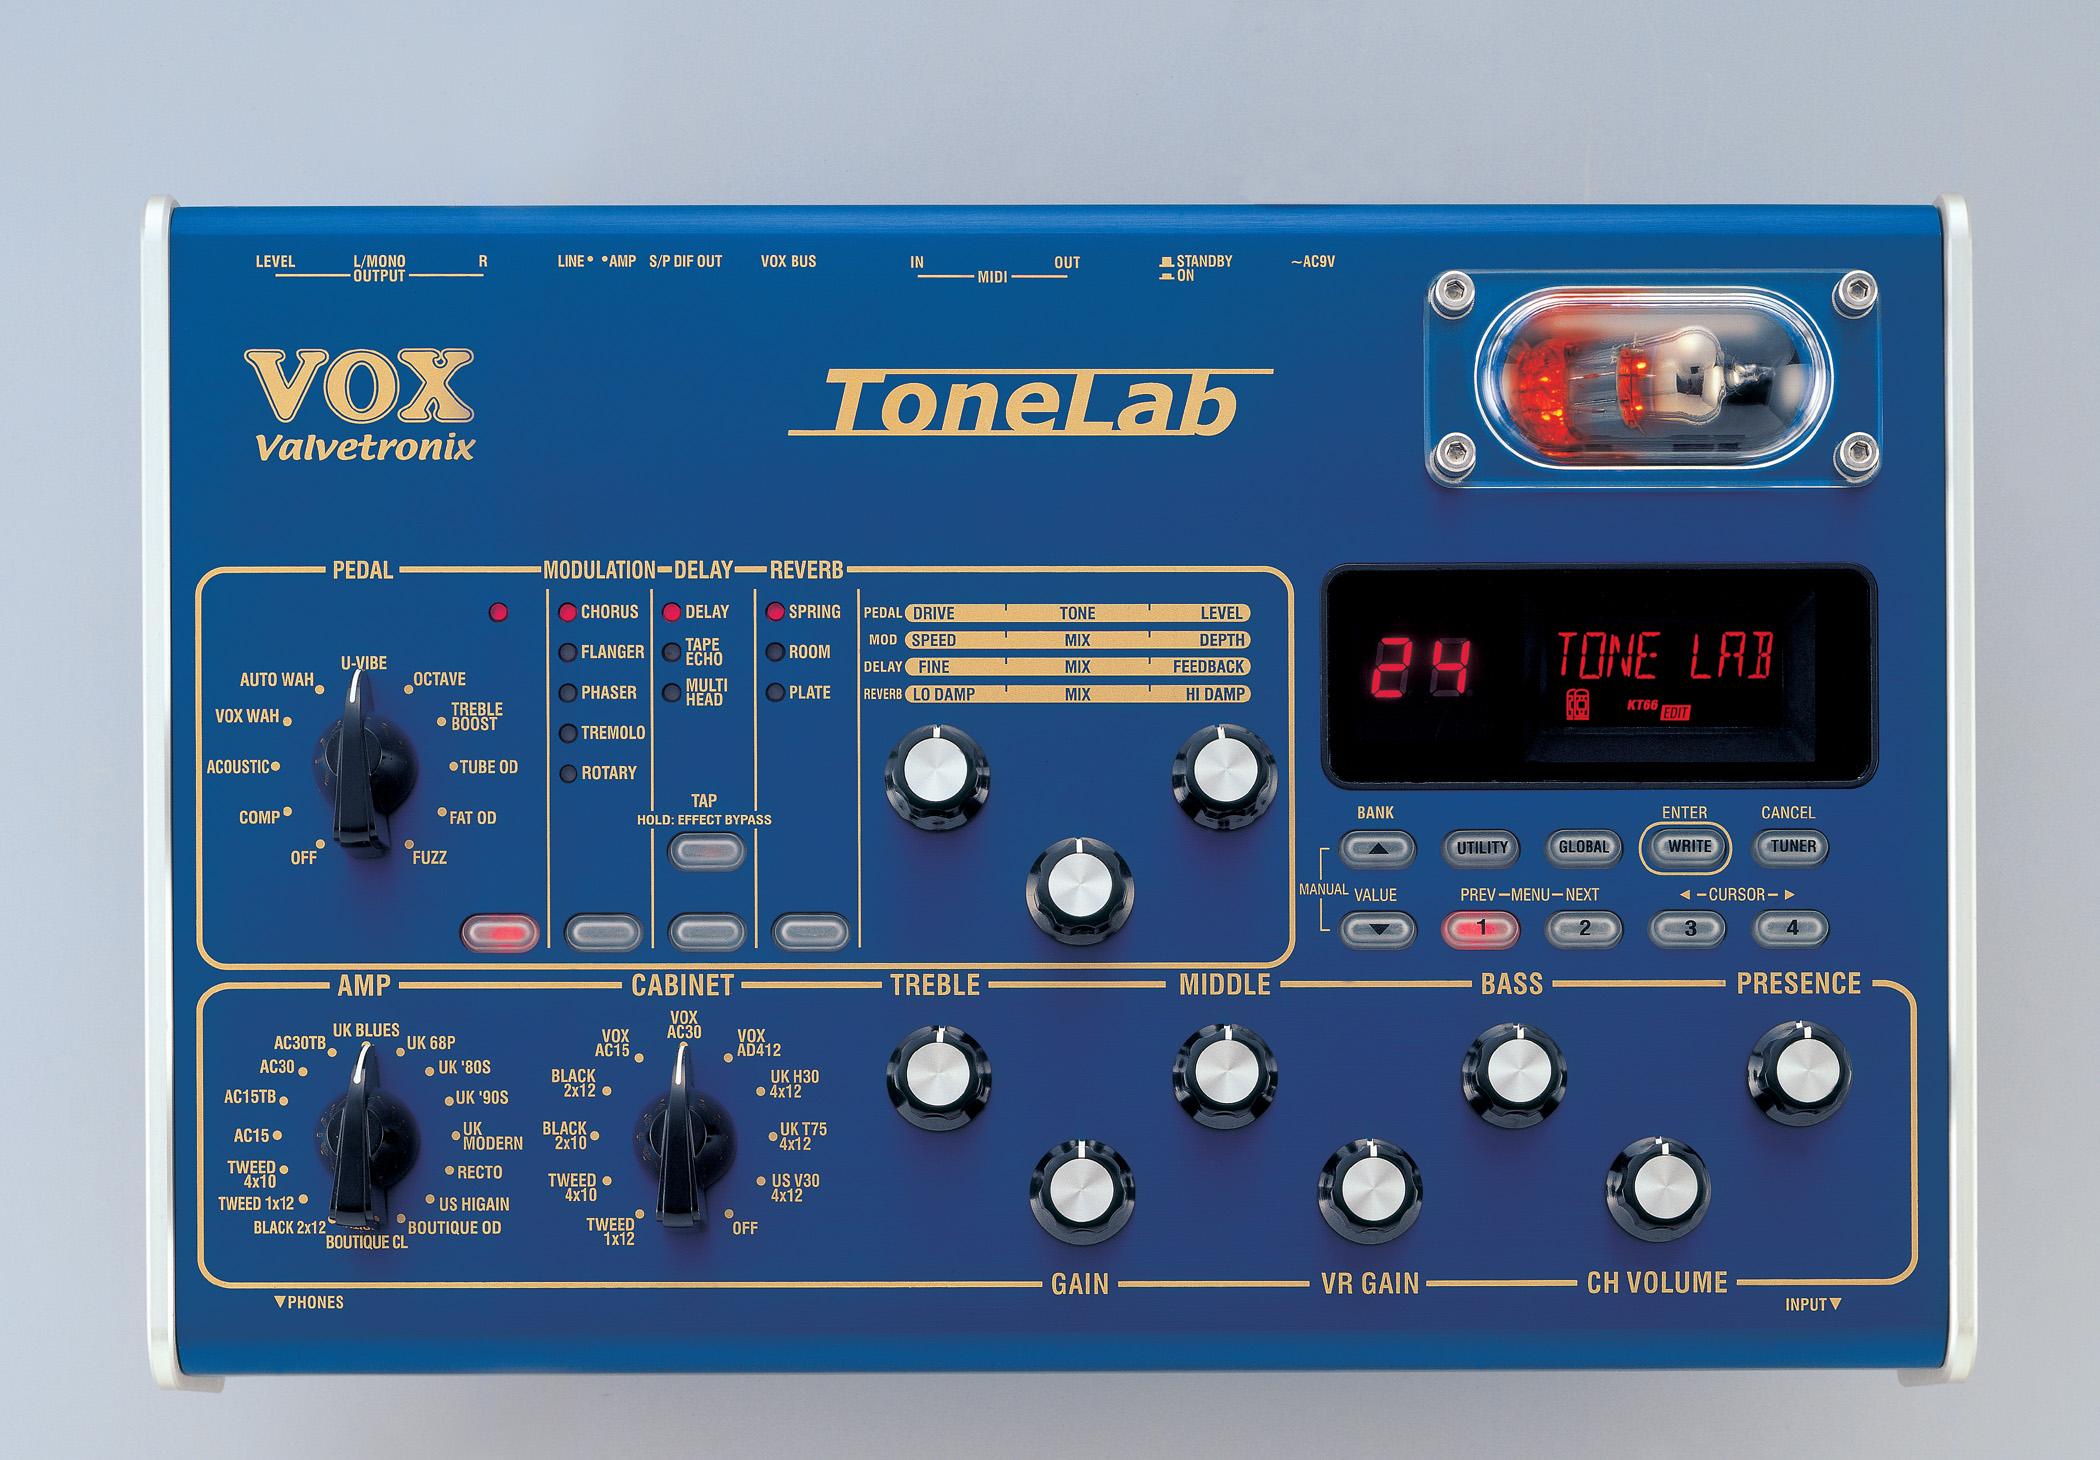 m elise s review vox tonelab audiofanzine rh en audiofanzine com vox tonelab ex user manual Vox Tonelab Le Patches